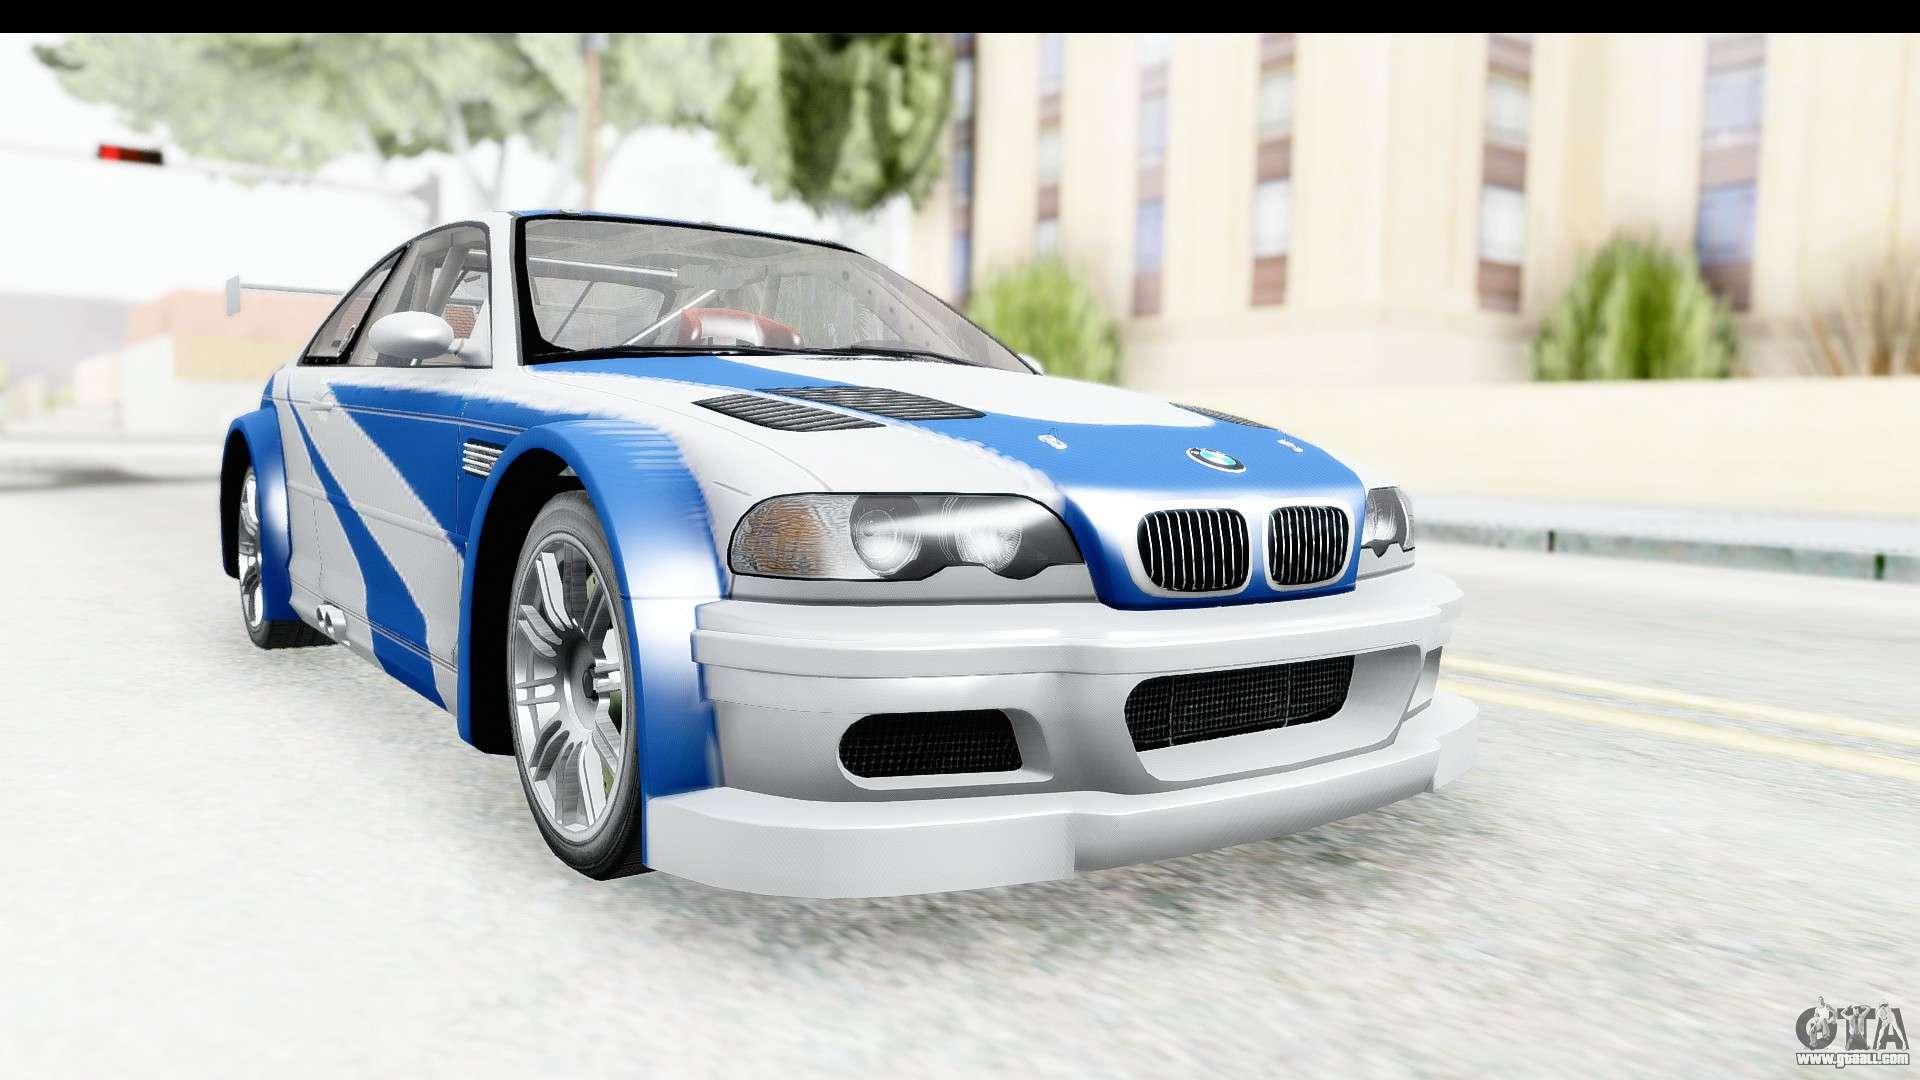 Bmw Cufflinks NFS Carbon Cars - BMW. BMW M3 GTR MotorSport. Enlarge Image 0 User ...